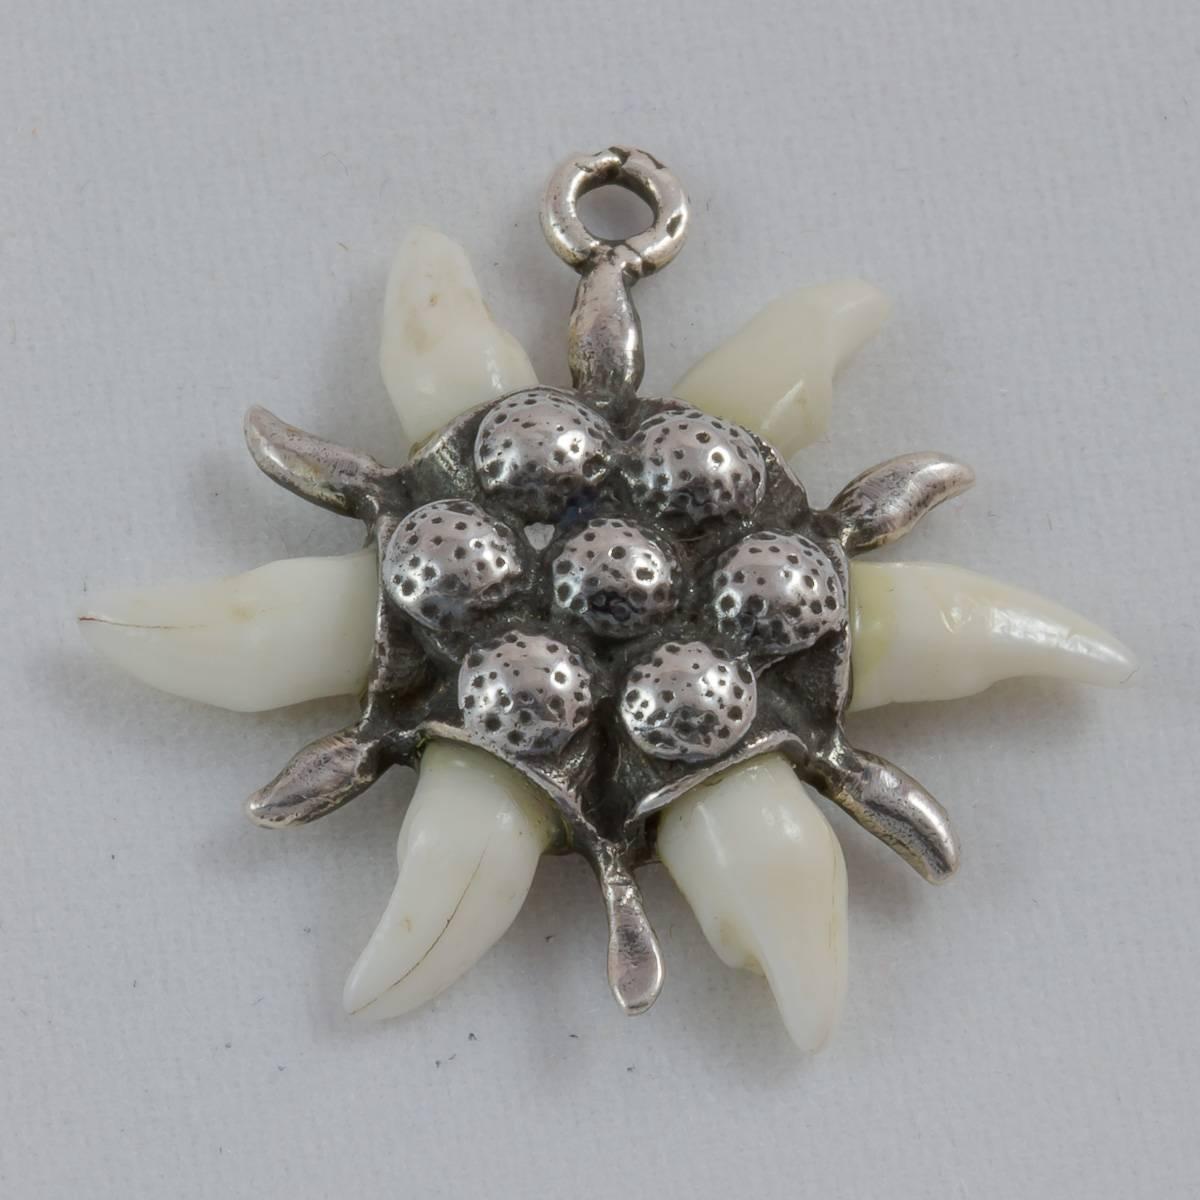 Marder-Edelweiss